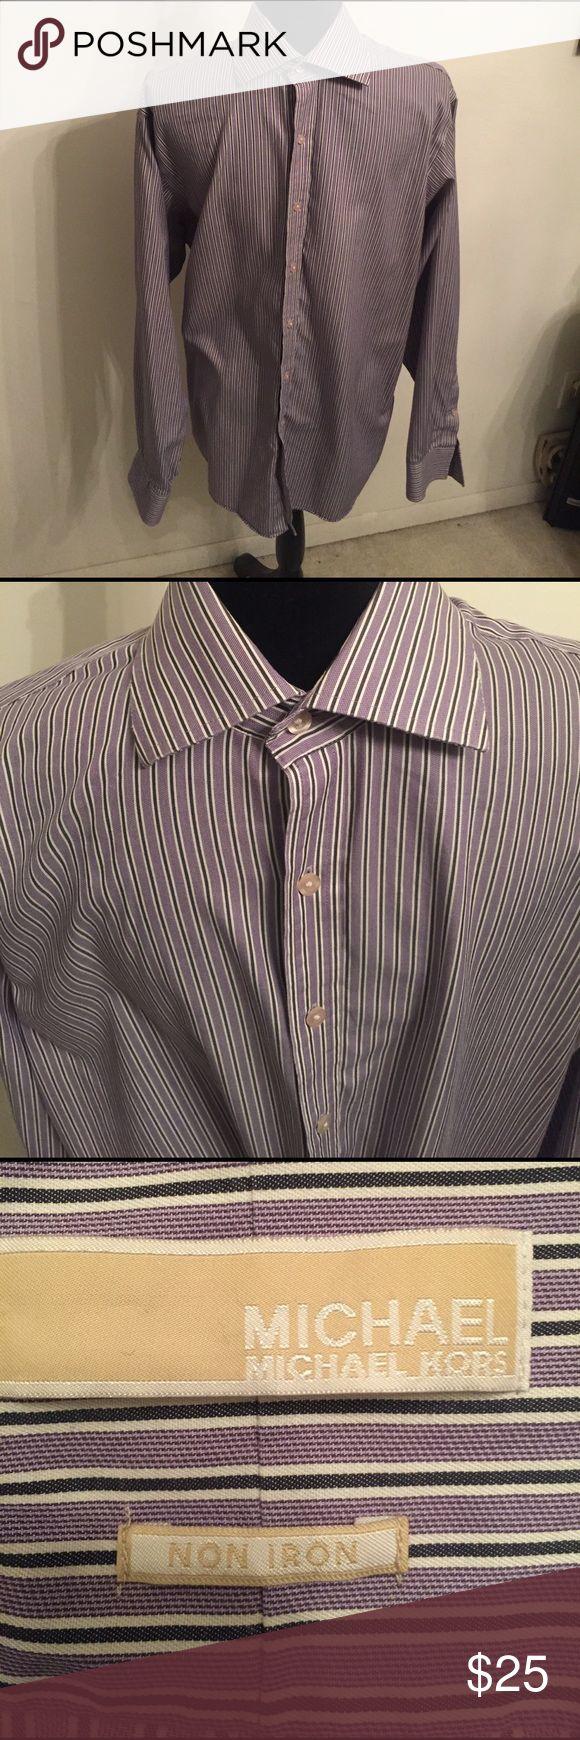 MICHAEL (MICHAEL KORS) non iron dress shirt. MICHAEL dress shirt. Size 16 1/2. 34/35. Perfect for Easter. It is non iron. Shirts Dress Shirts